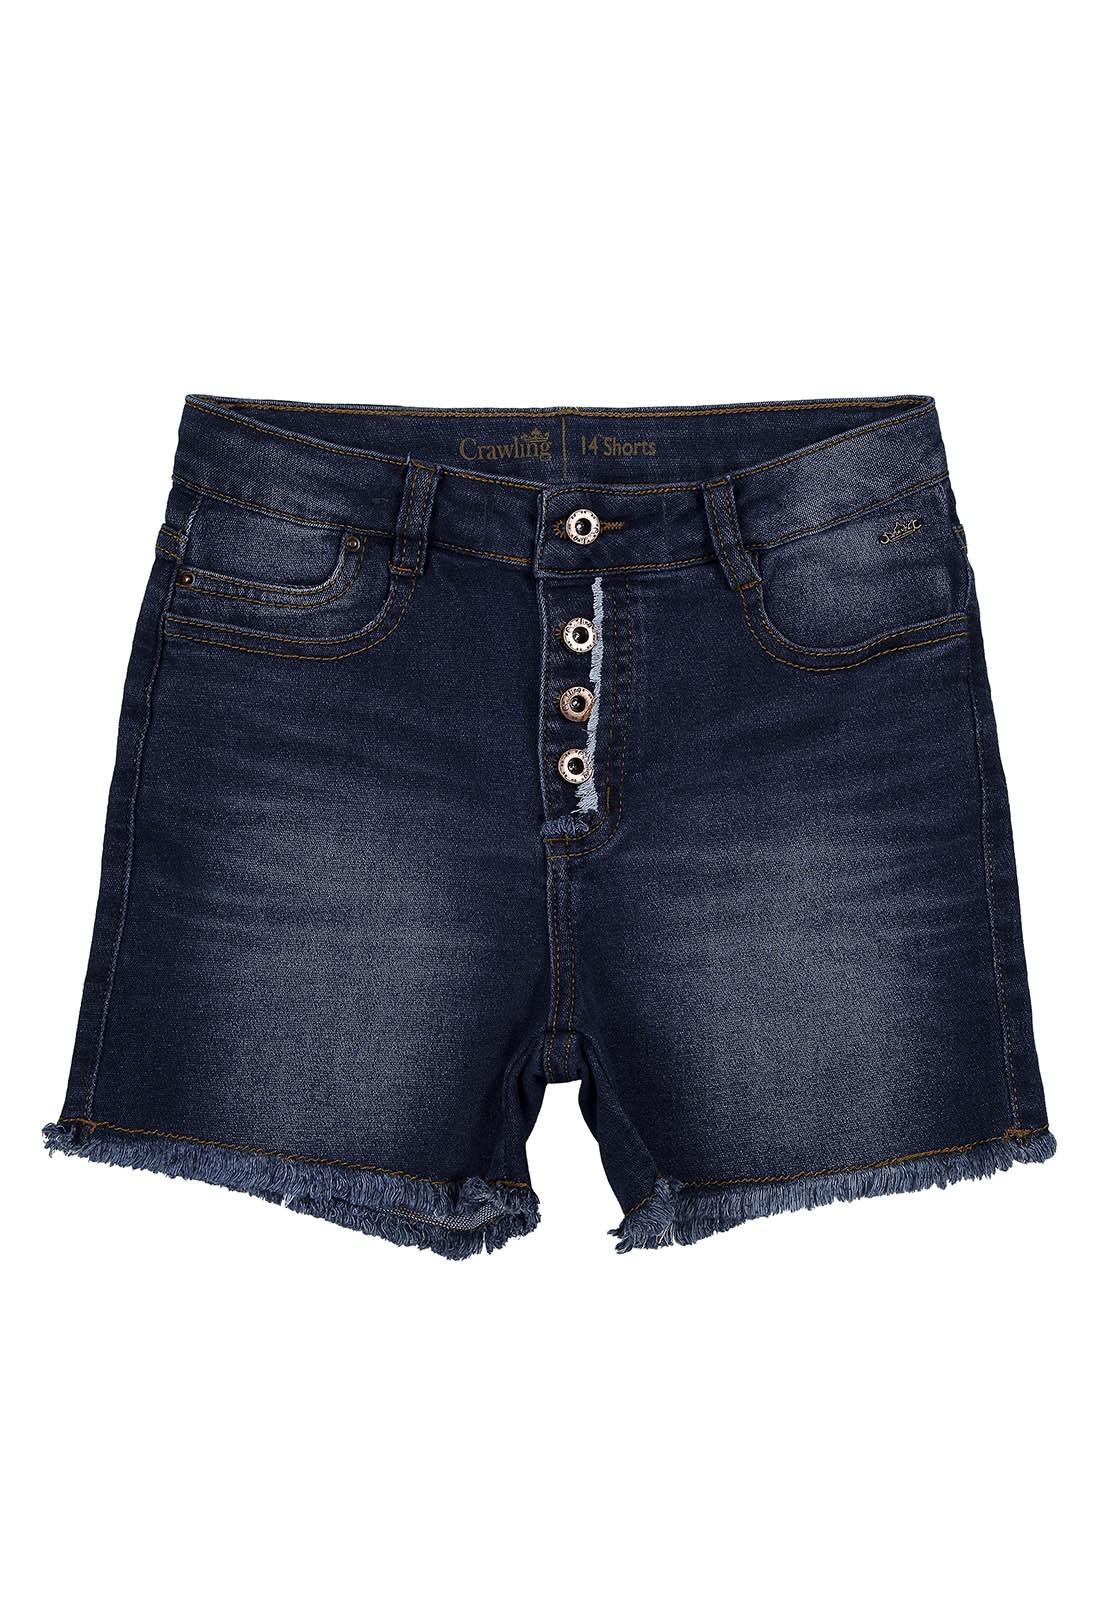 Short Crawlilng Jeans Feminino